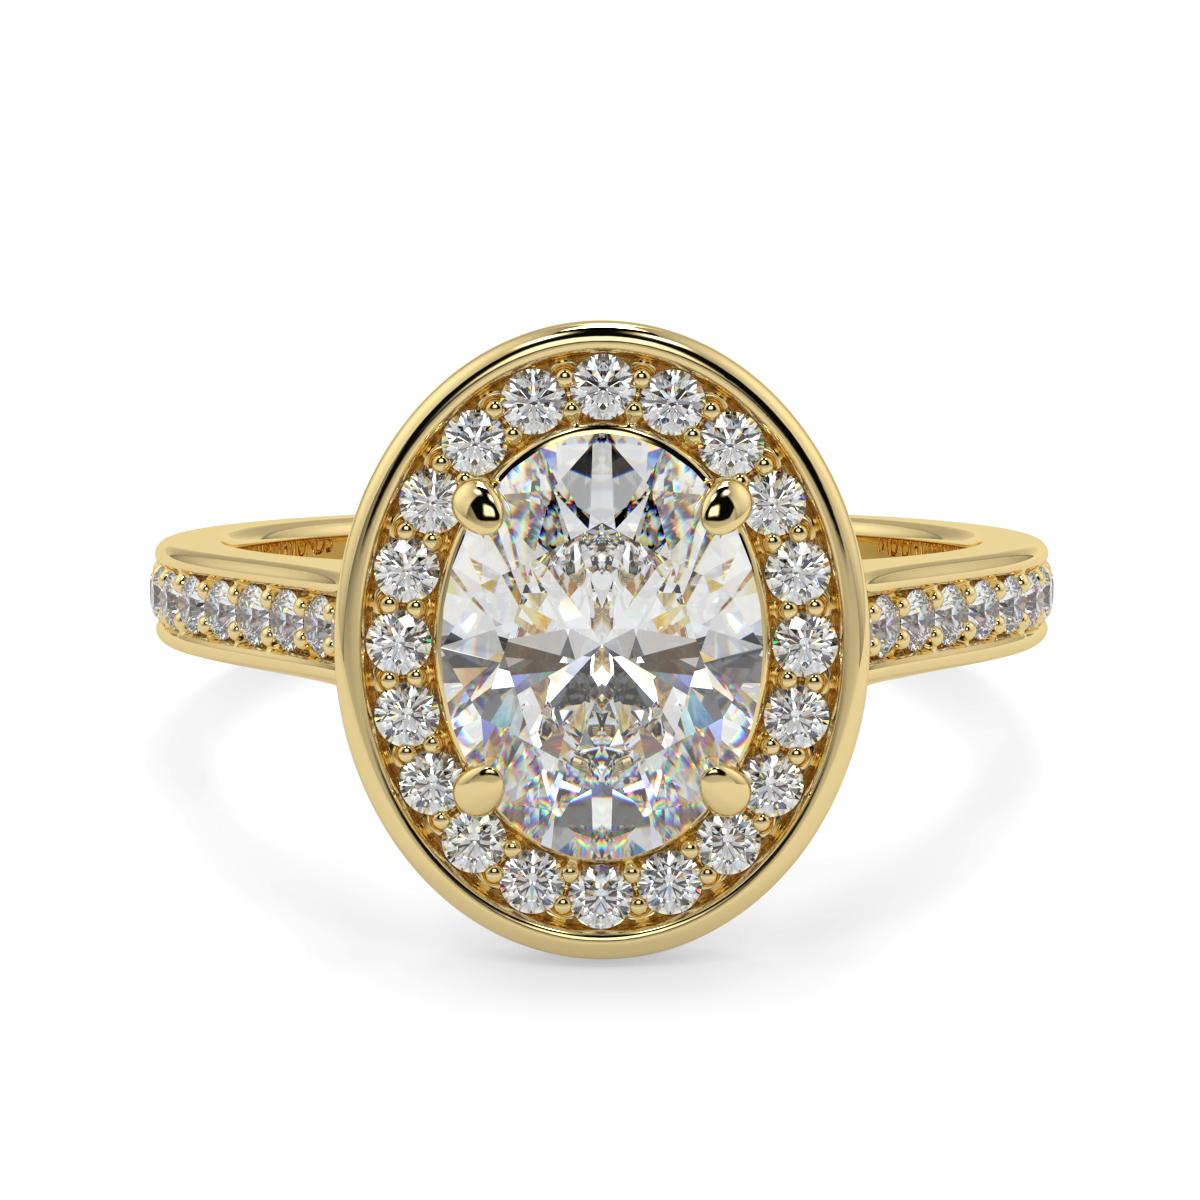 Oval Halo Pave Set Diamond Ring